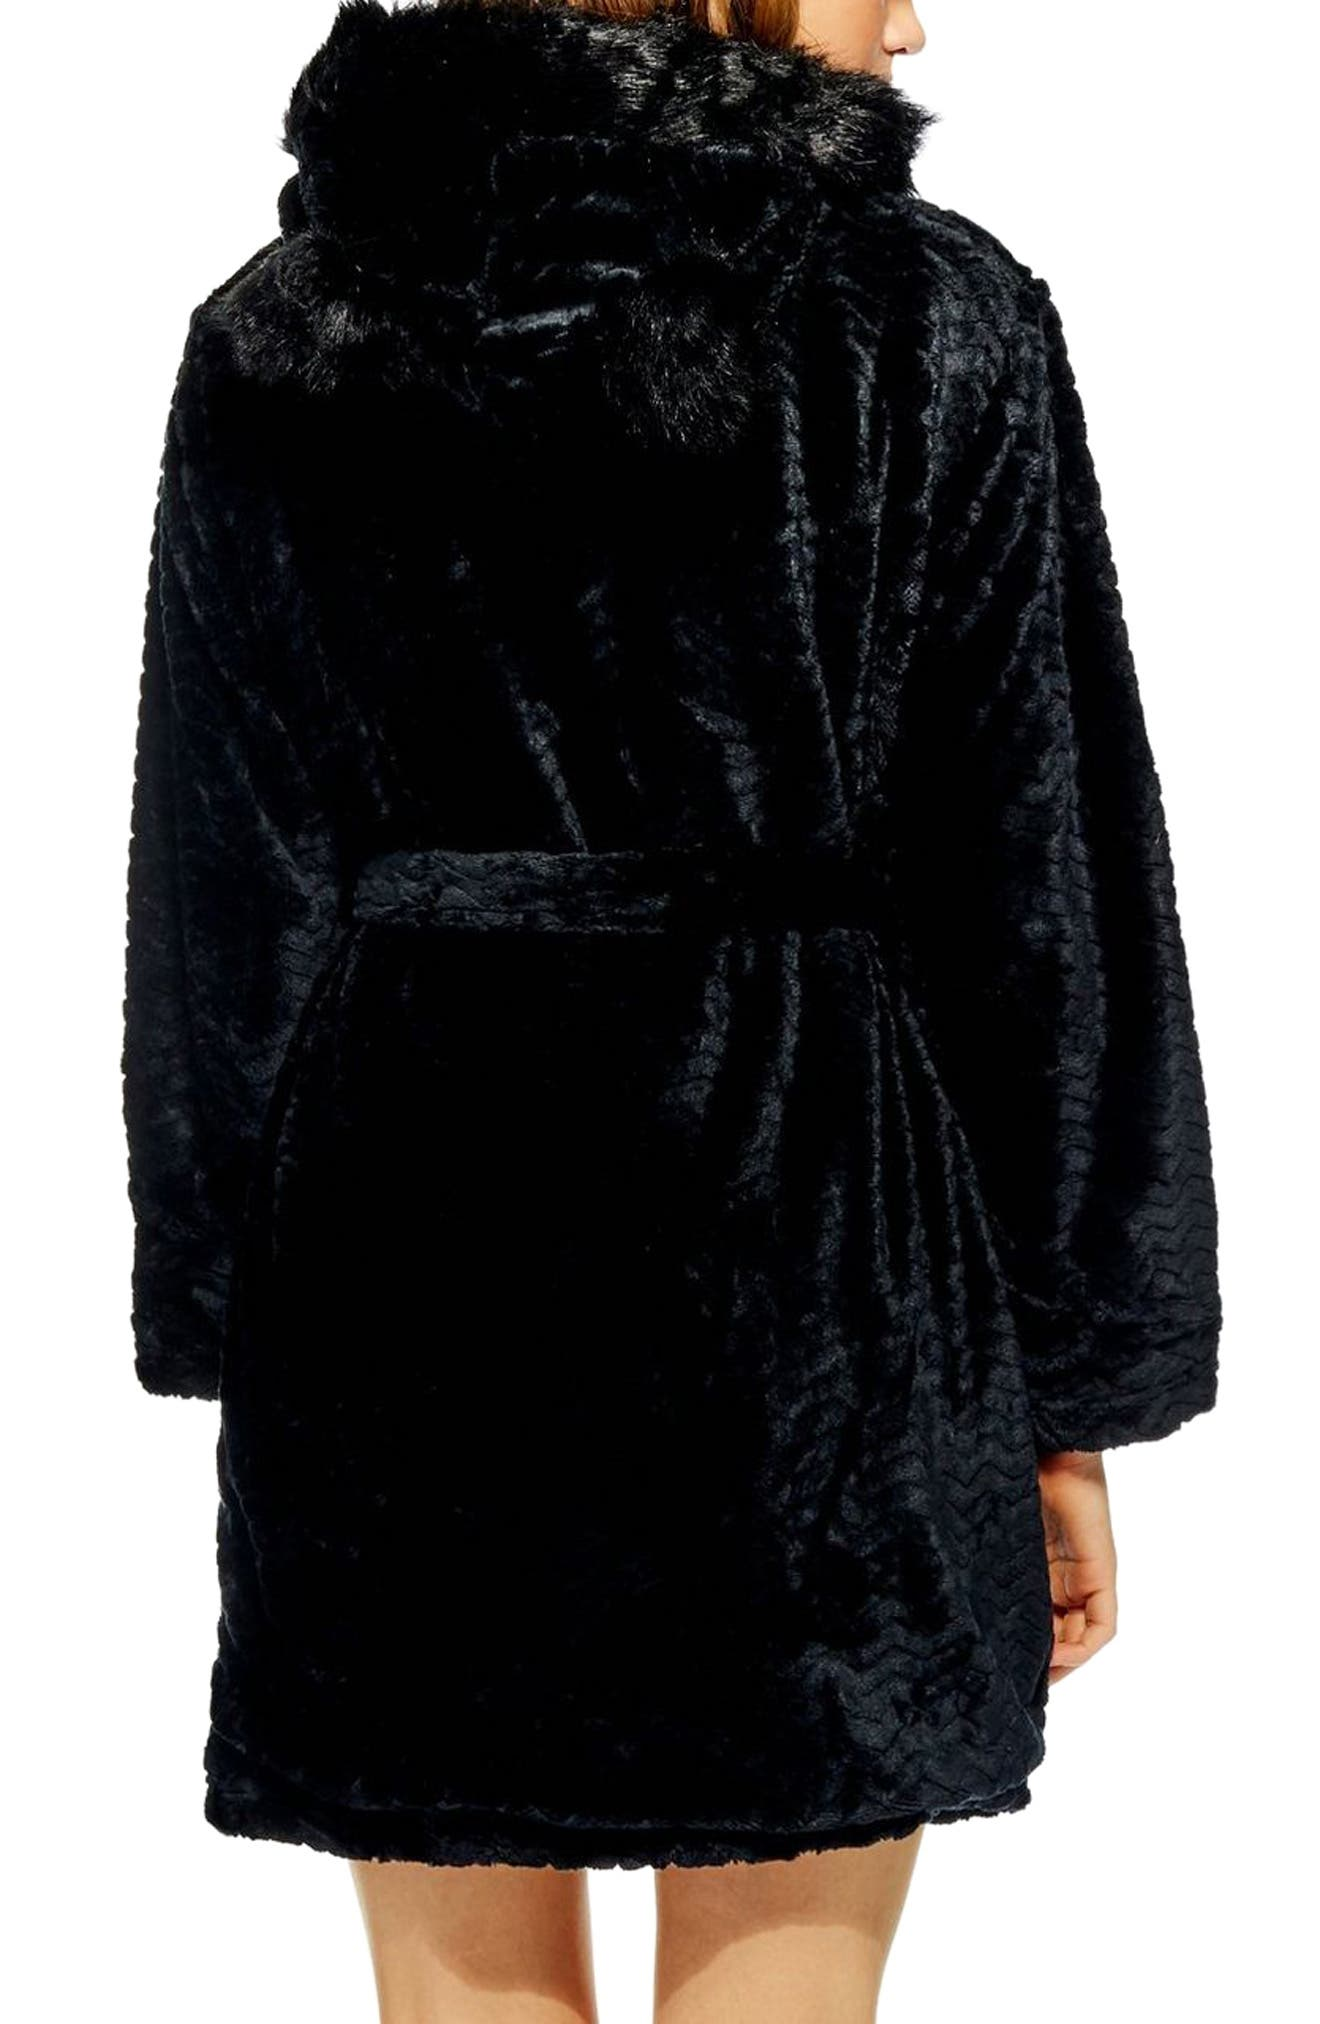 Kimmie Hooded Short Robe,                             Alternate thumbnail 2, color,                             BLACK